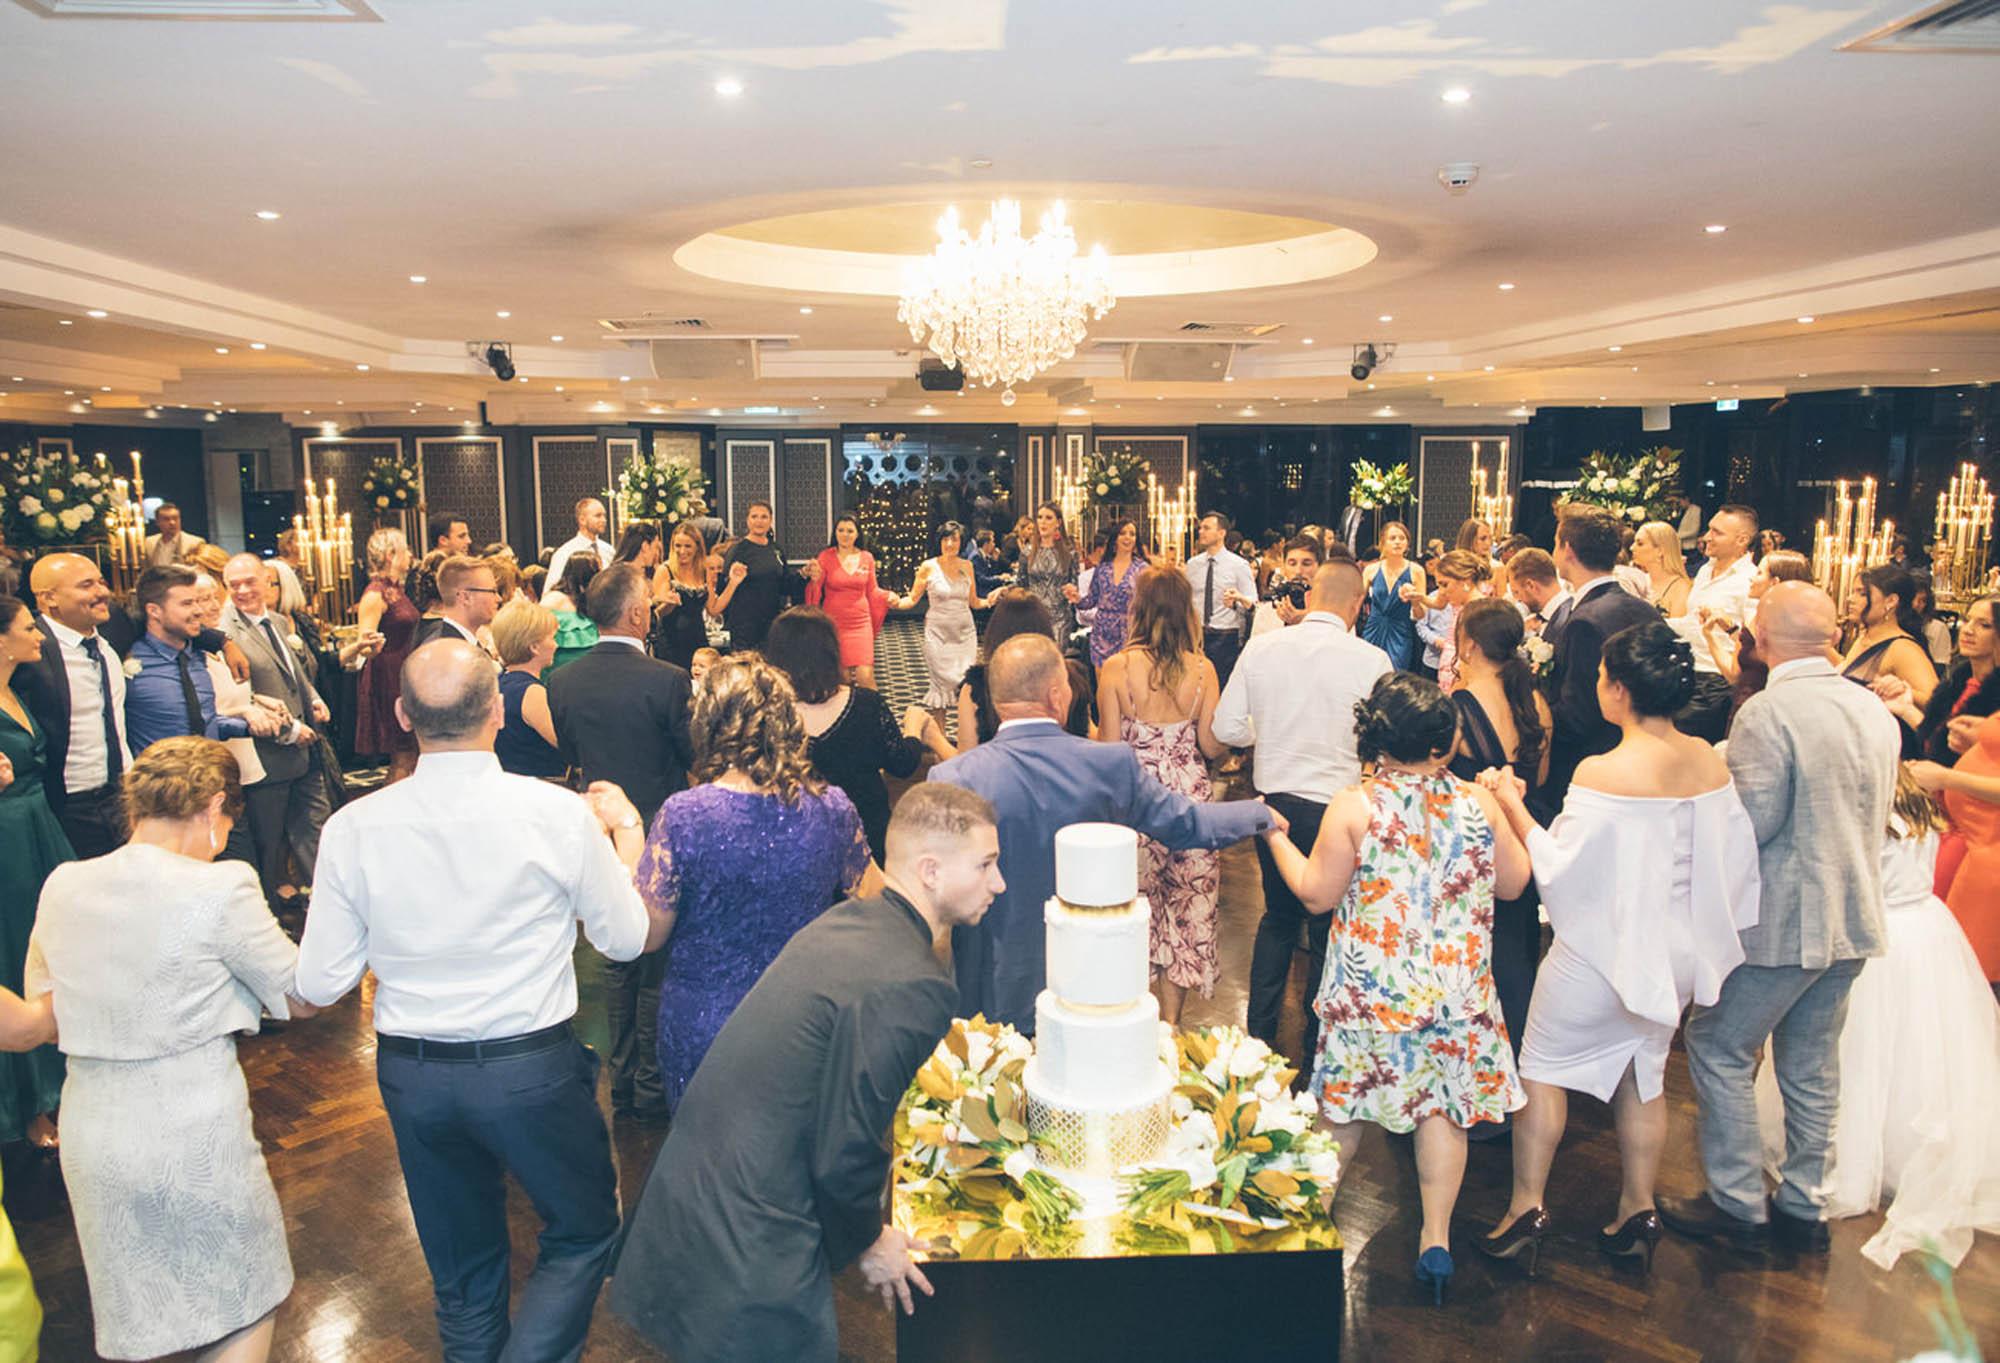 MacDougall-Photography-Sydney-Wedding-Photographers-86.jpg